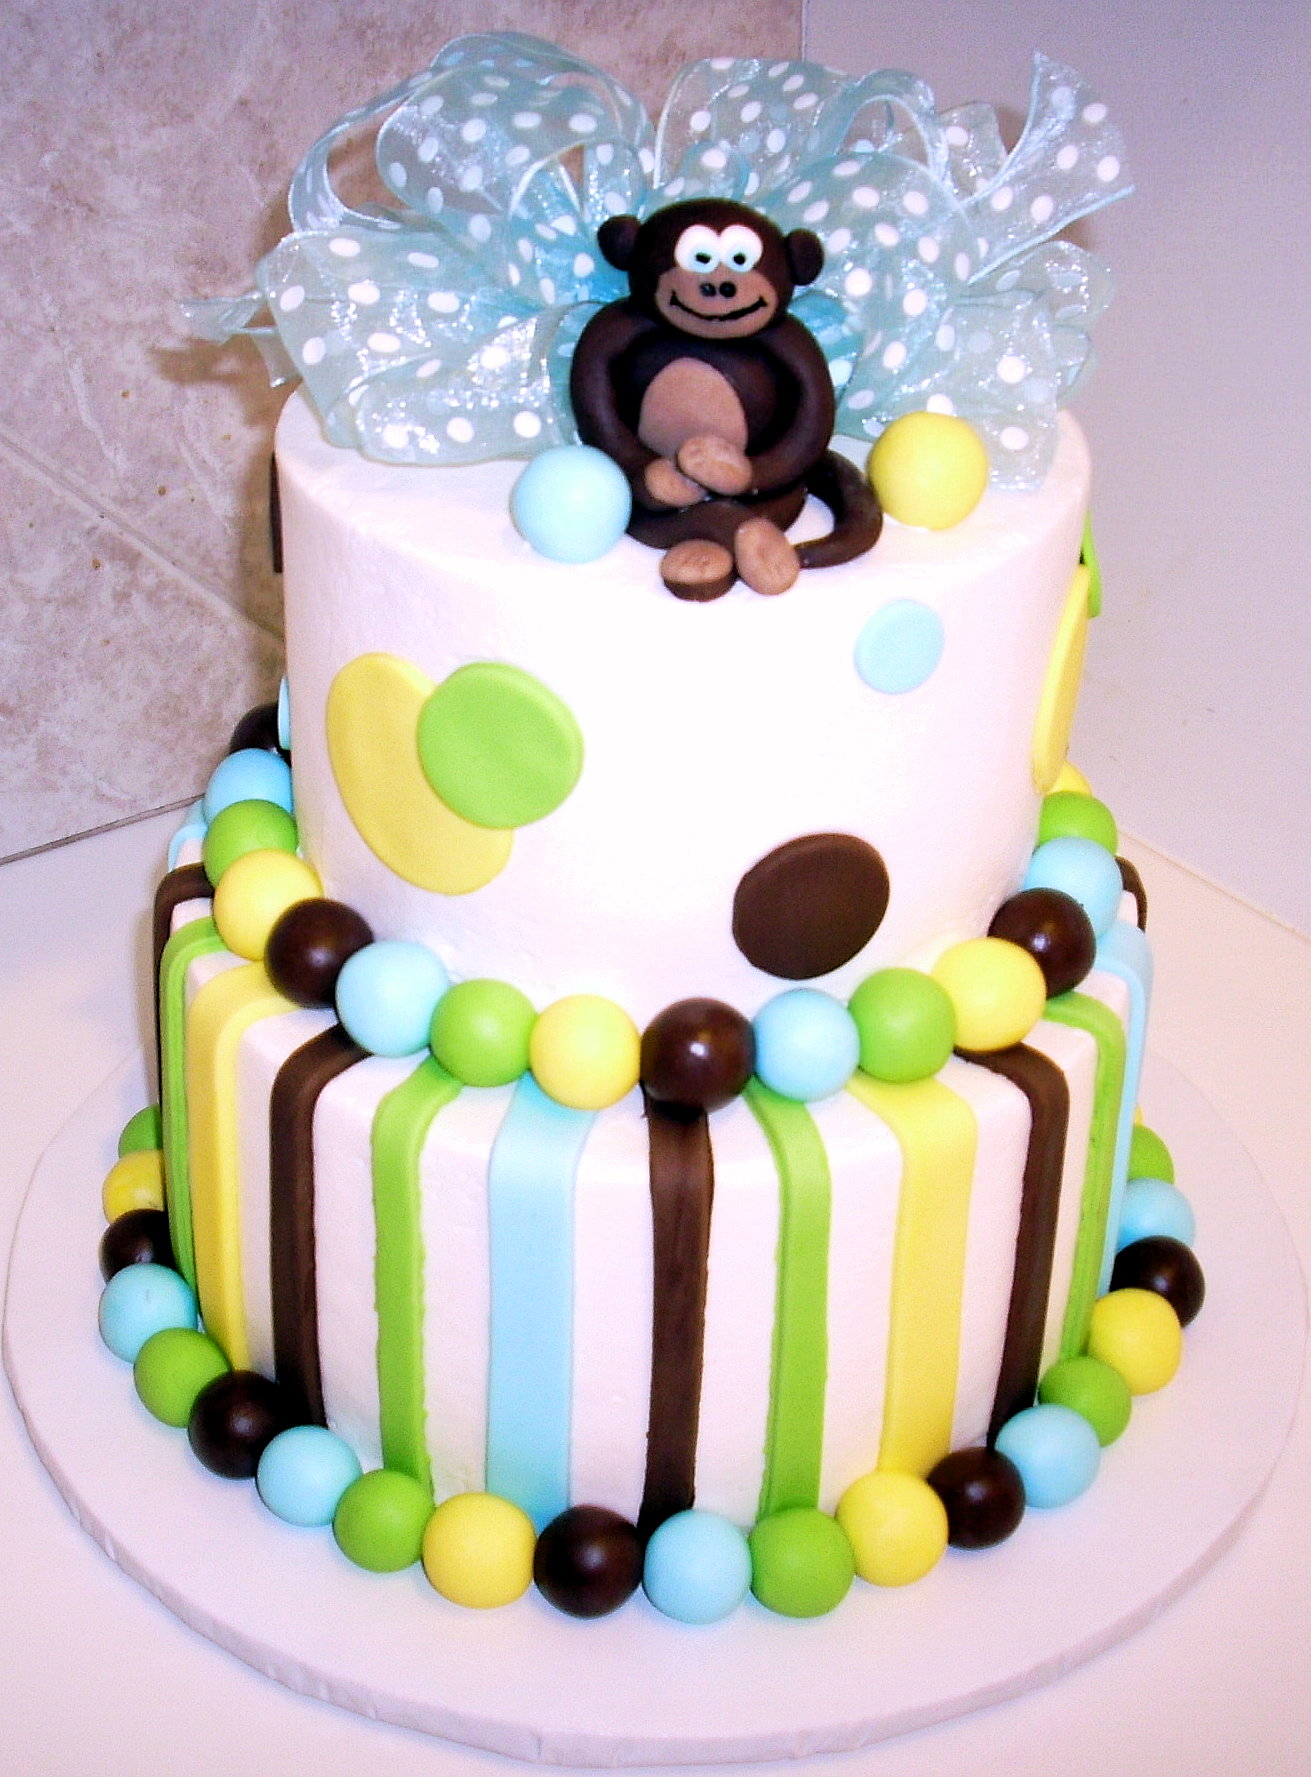 Admirable Monkey Cakes Decoration Ideas Little Birthday Cakes Personalised Birthday Cards Veneteletsinfo